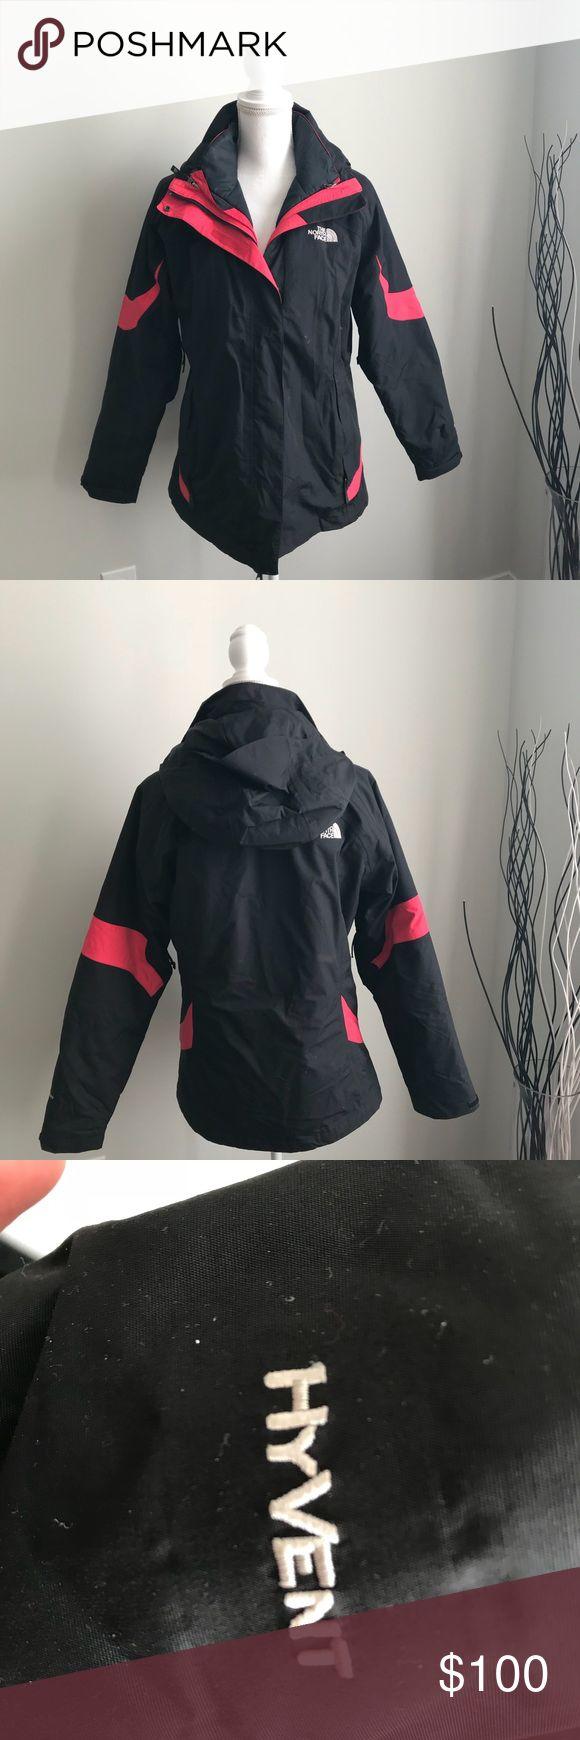 EUC The North Face HyVent Ski jacket size Large EUC The North Face Ladies HyVent Ski jacket Size Large North Face Jackets & Coats